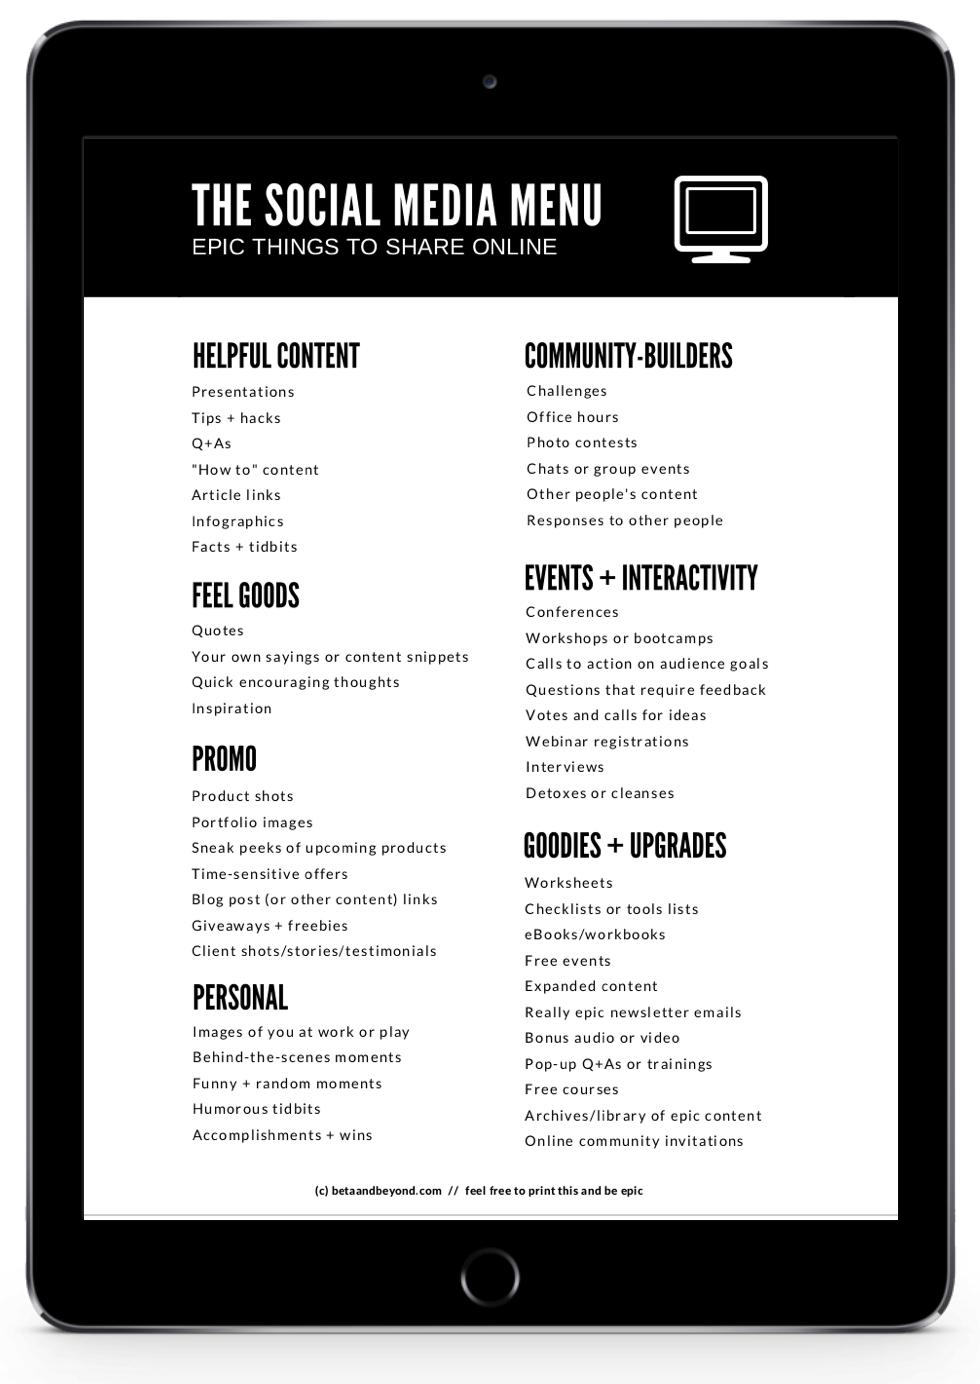 social media menu.png